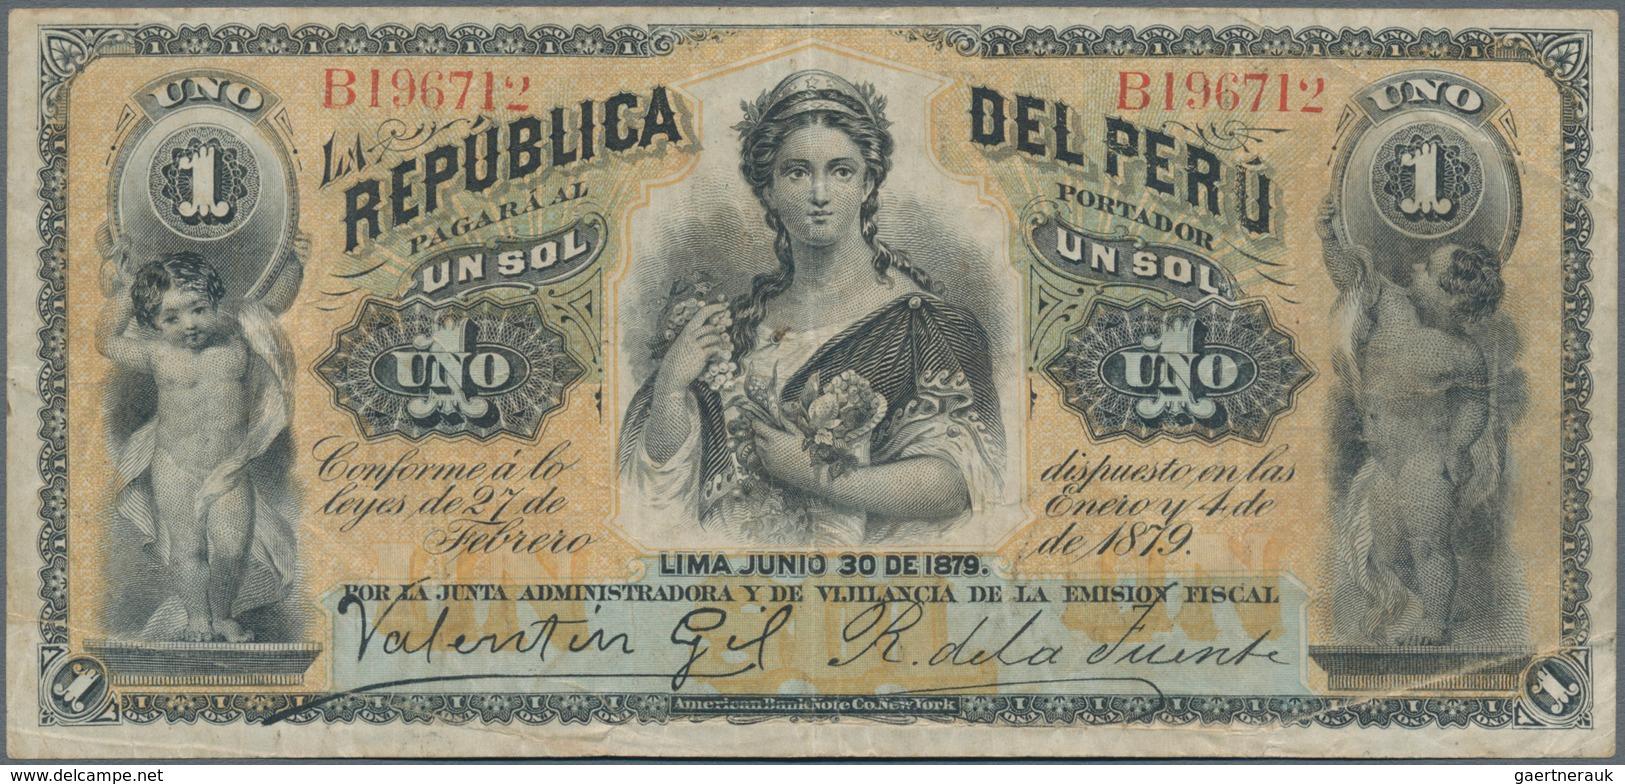 Peru: Pair With 1 Sol Republica Del Peru 1879 P.1 (VF) And 500 Soles De Oro 1952 Banco Central De Re - Peru